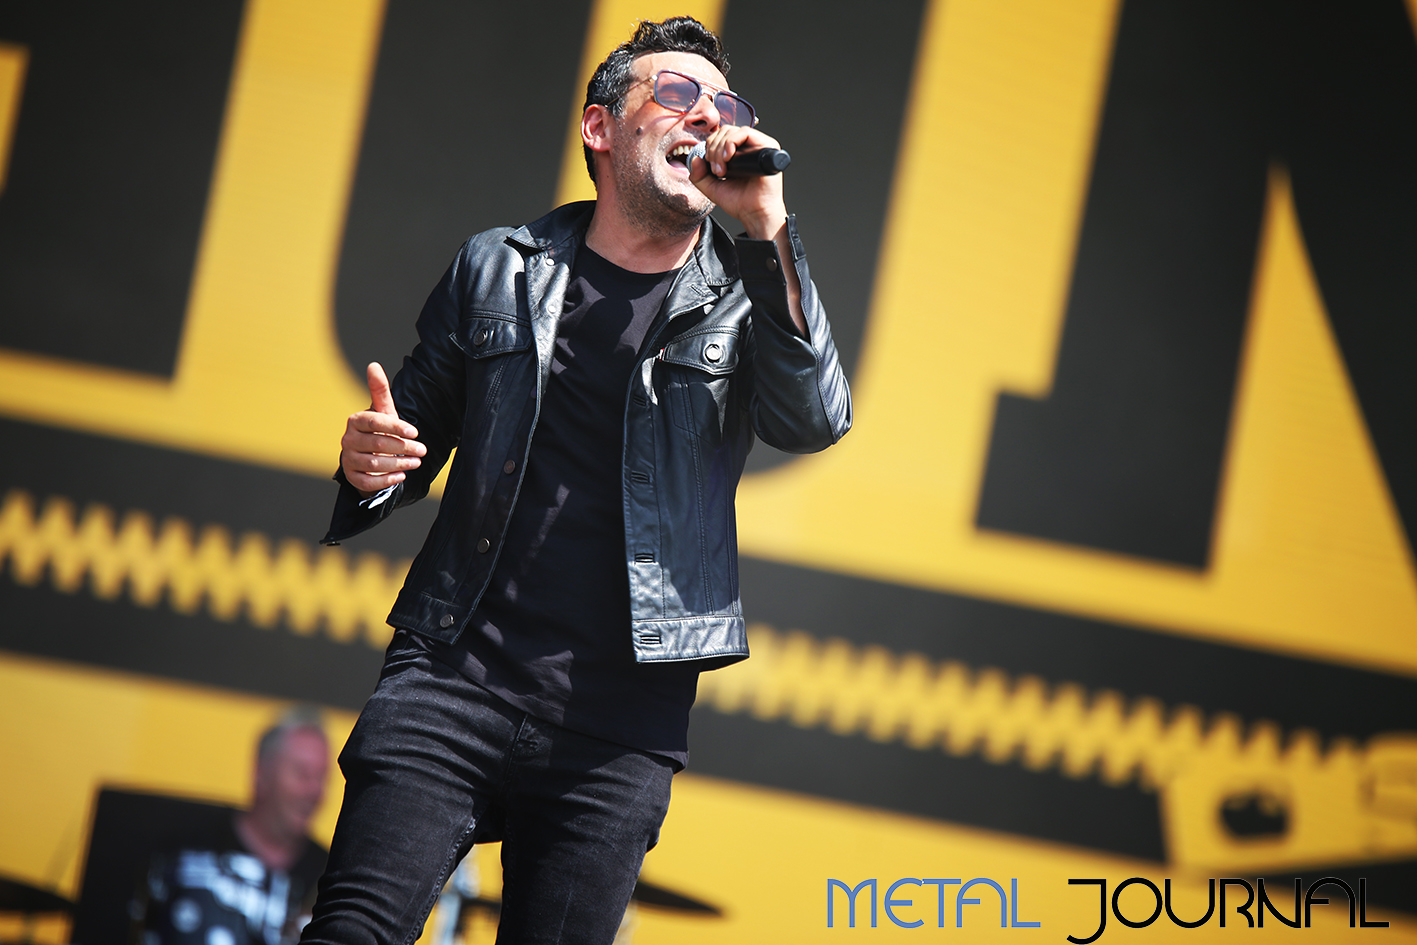 gun-metal journal rock fest barcelona 2019 pic 6